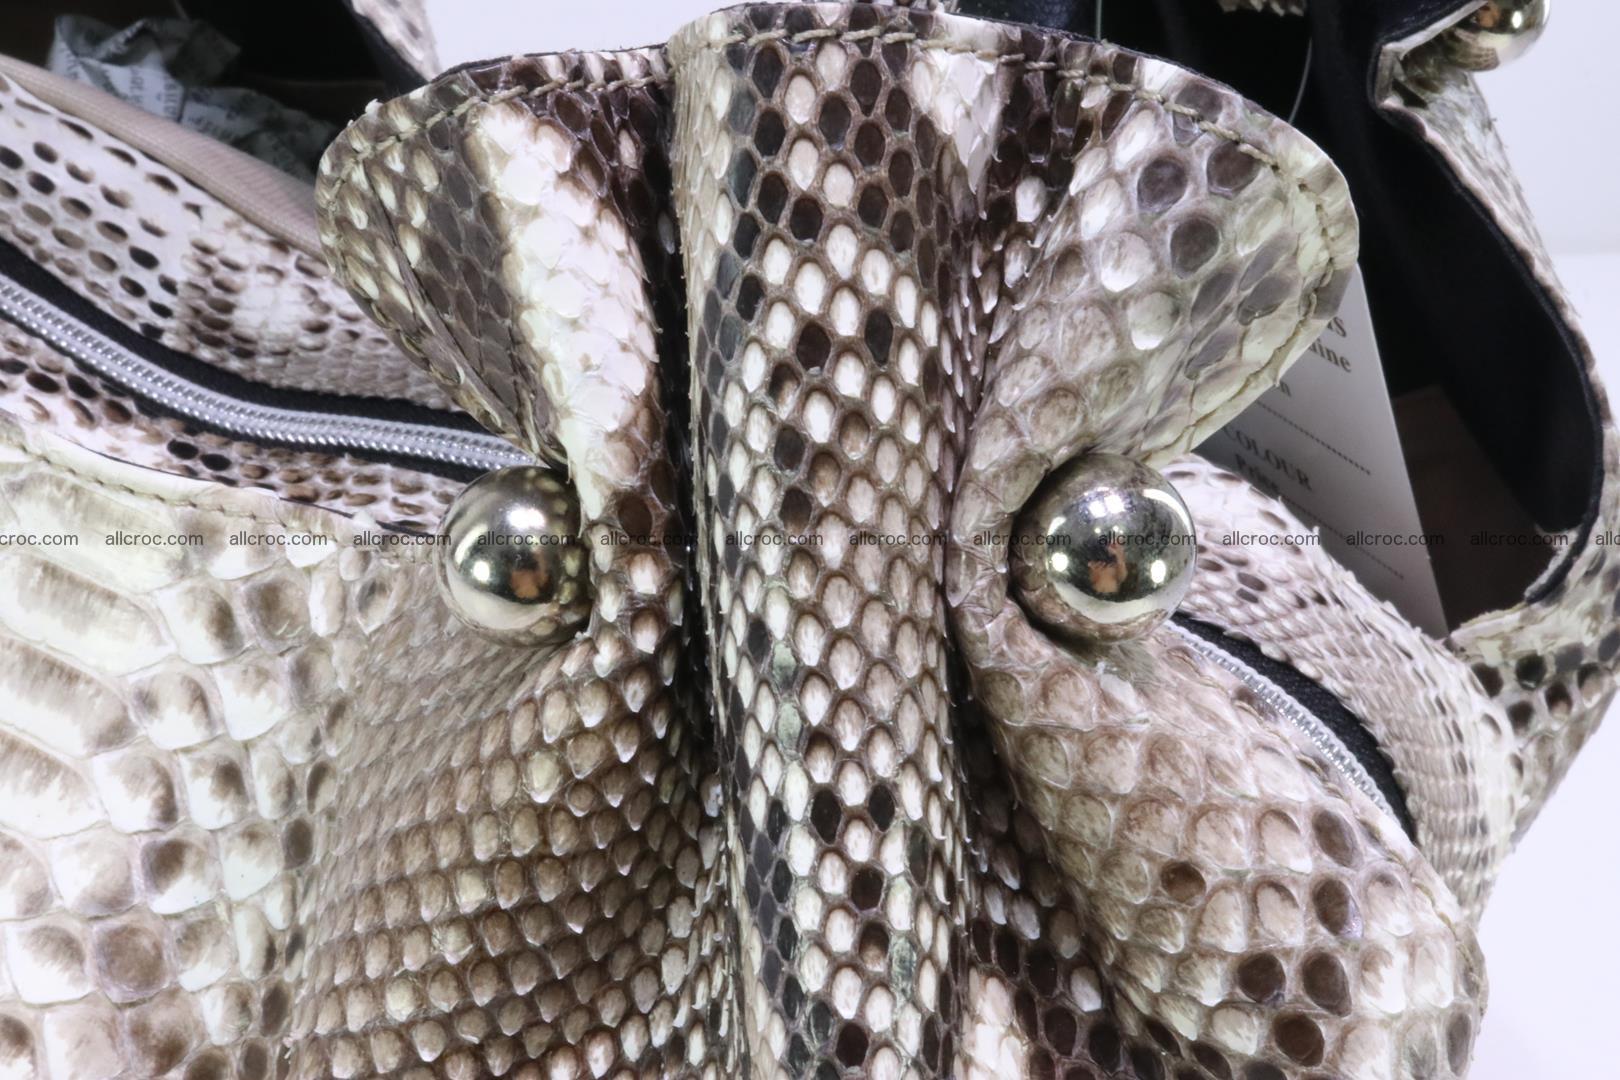 Python skin handbag for lady from genuine Python skin 198 Foto 9